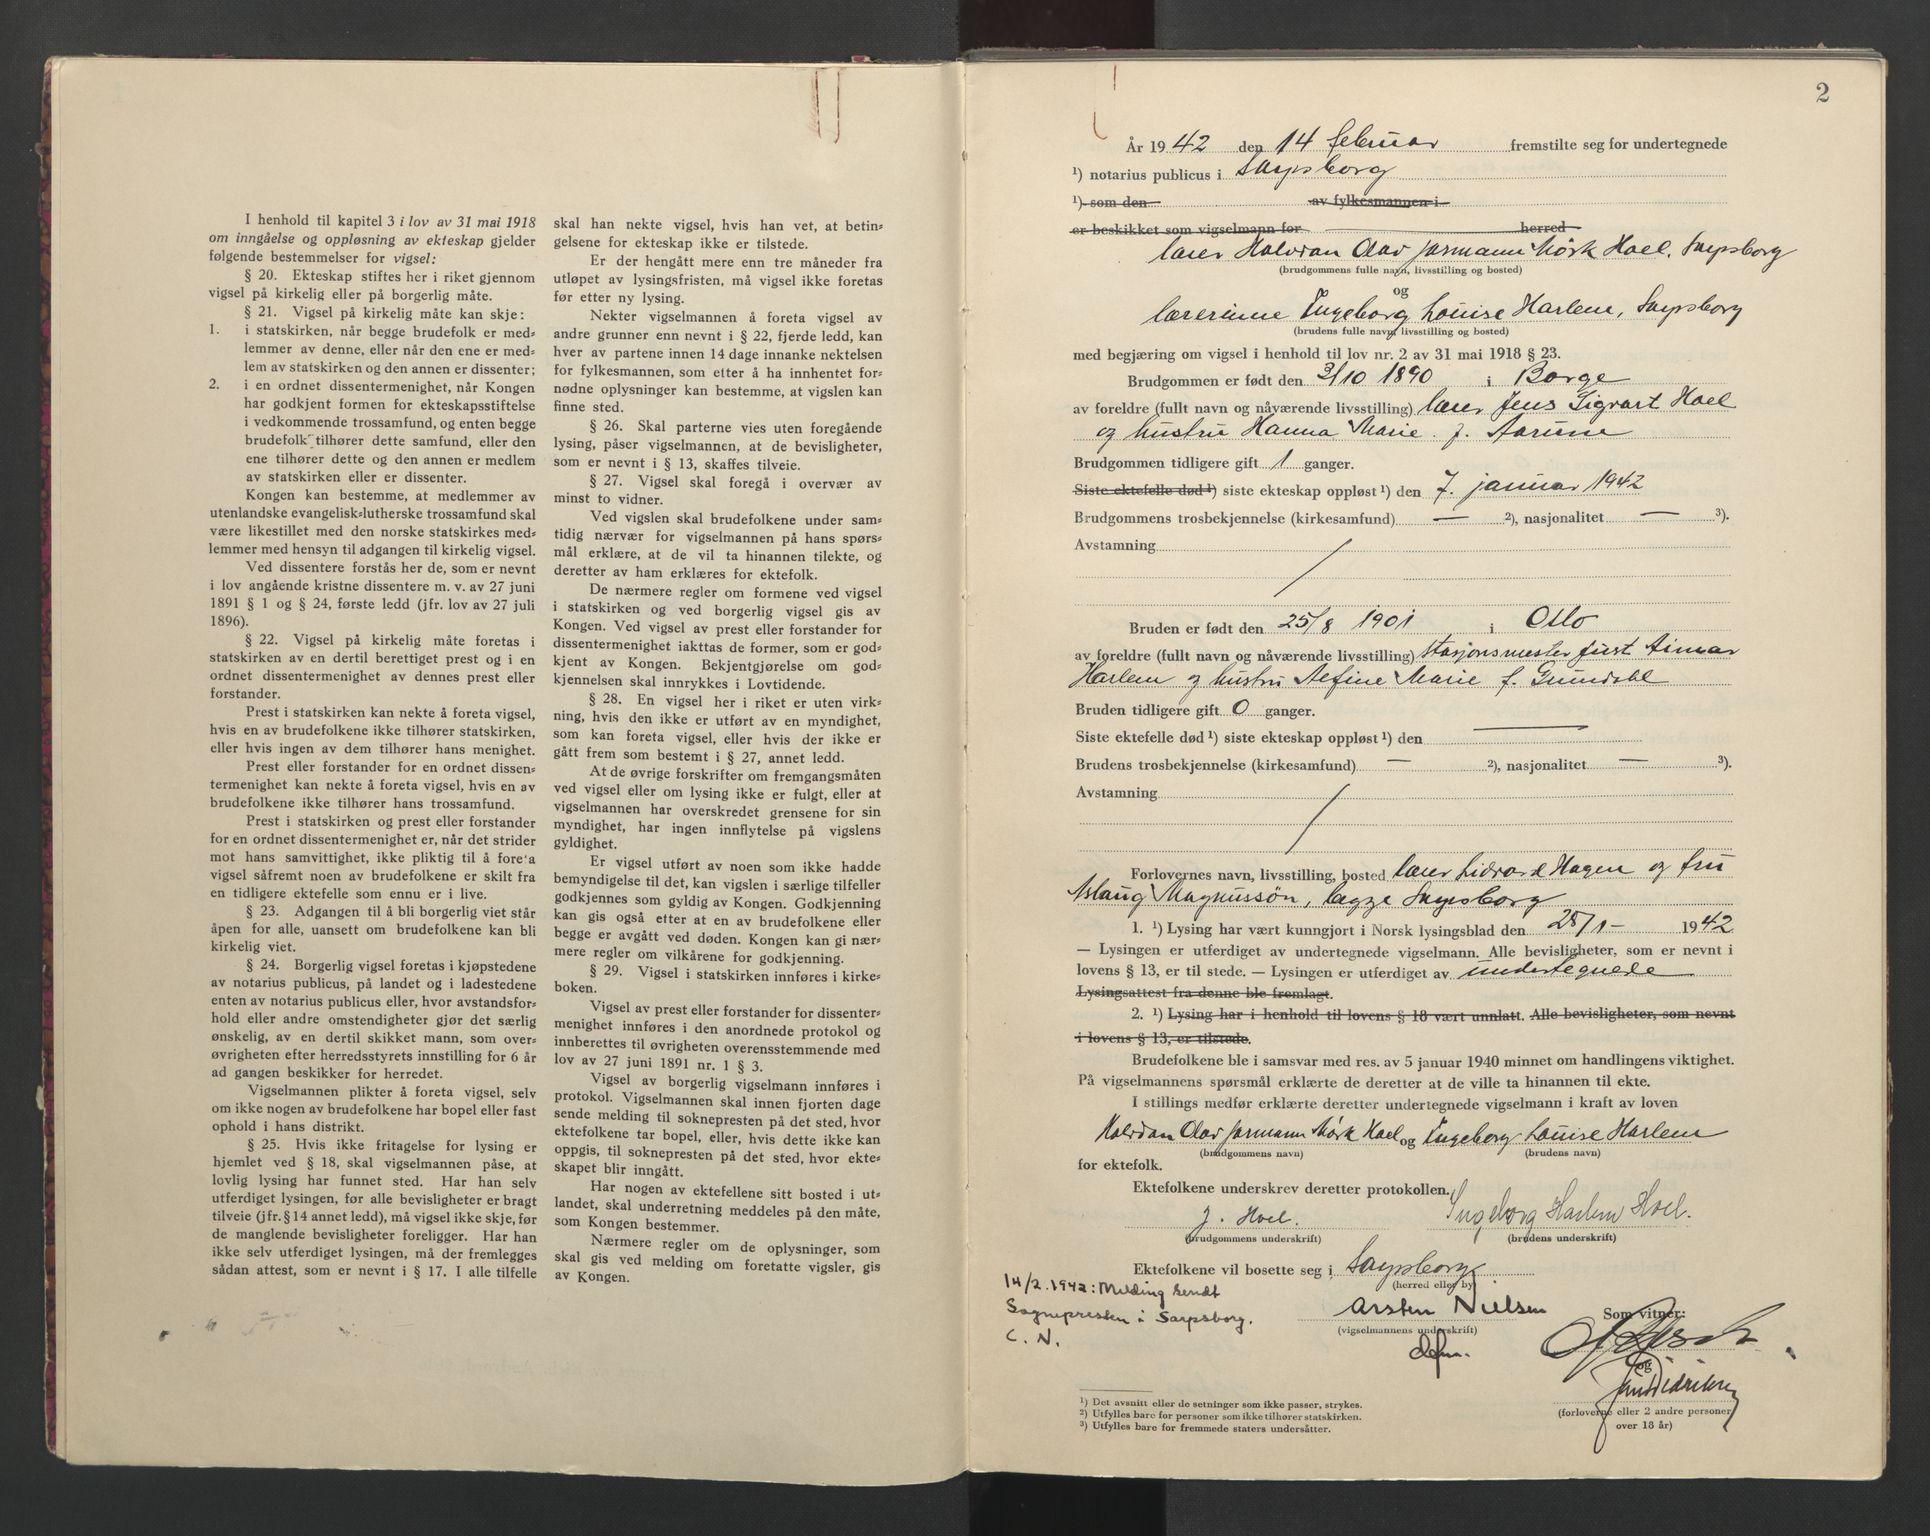 SAO, Sarpsborg byfogd, L/Lb/Lba/L0002: Vigselbok, 1942-1943, s. 2